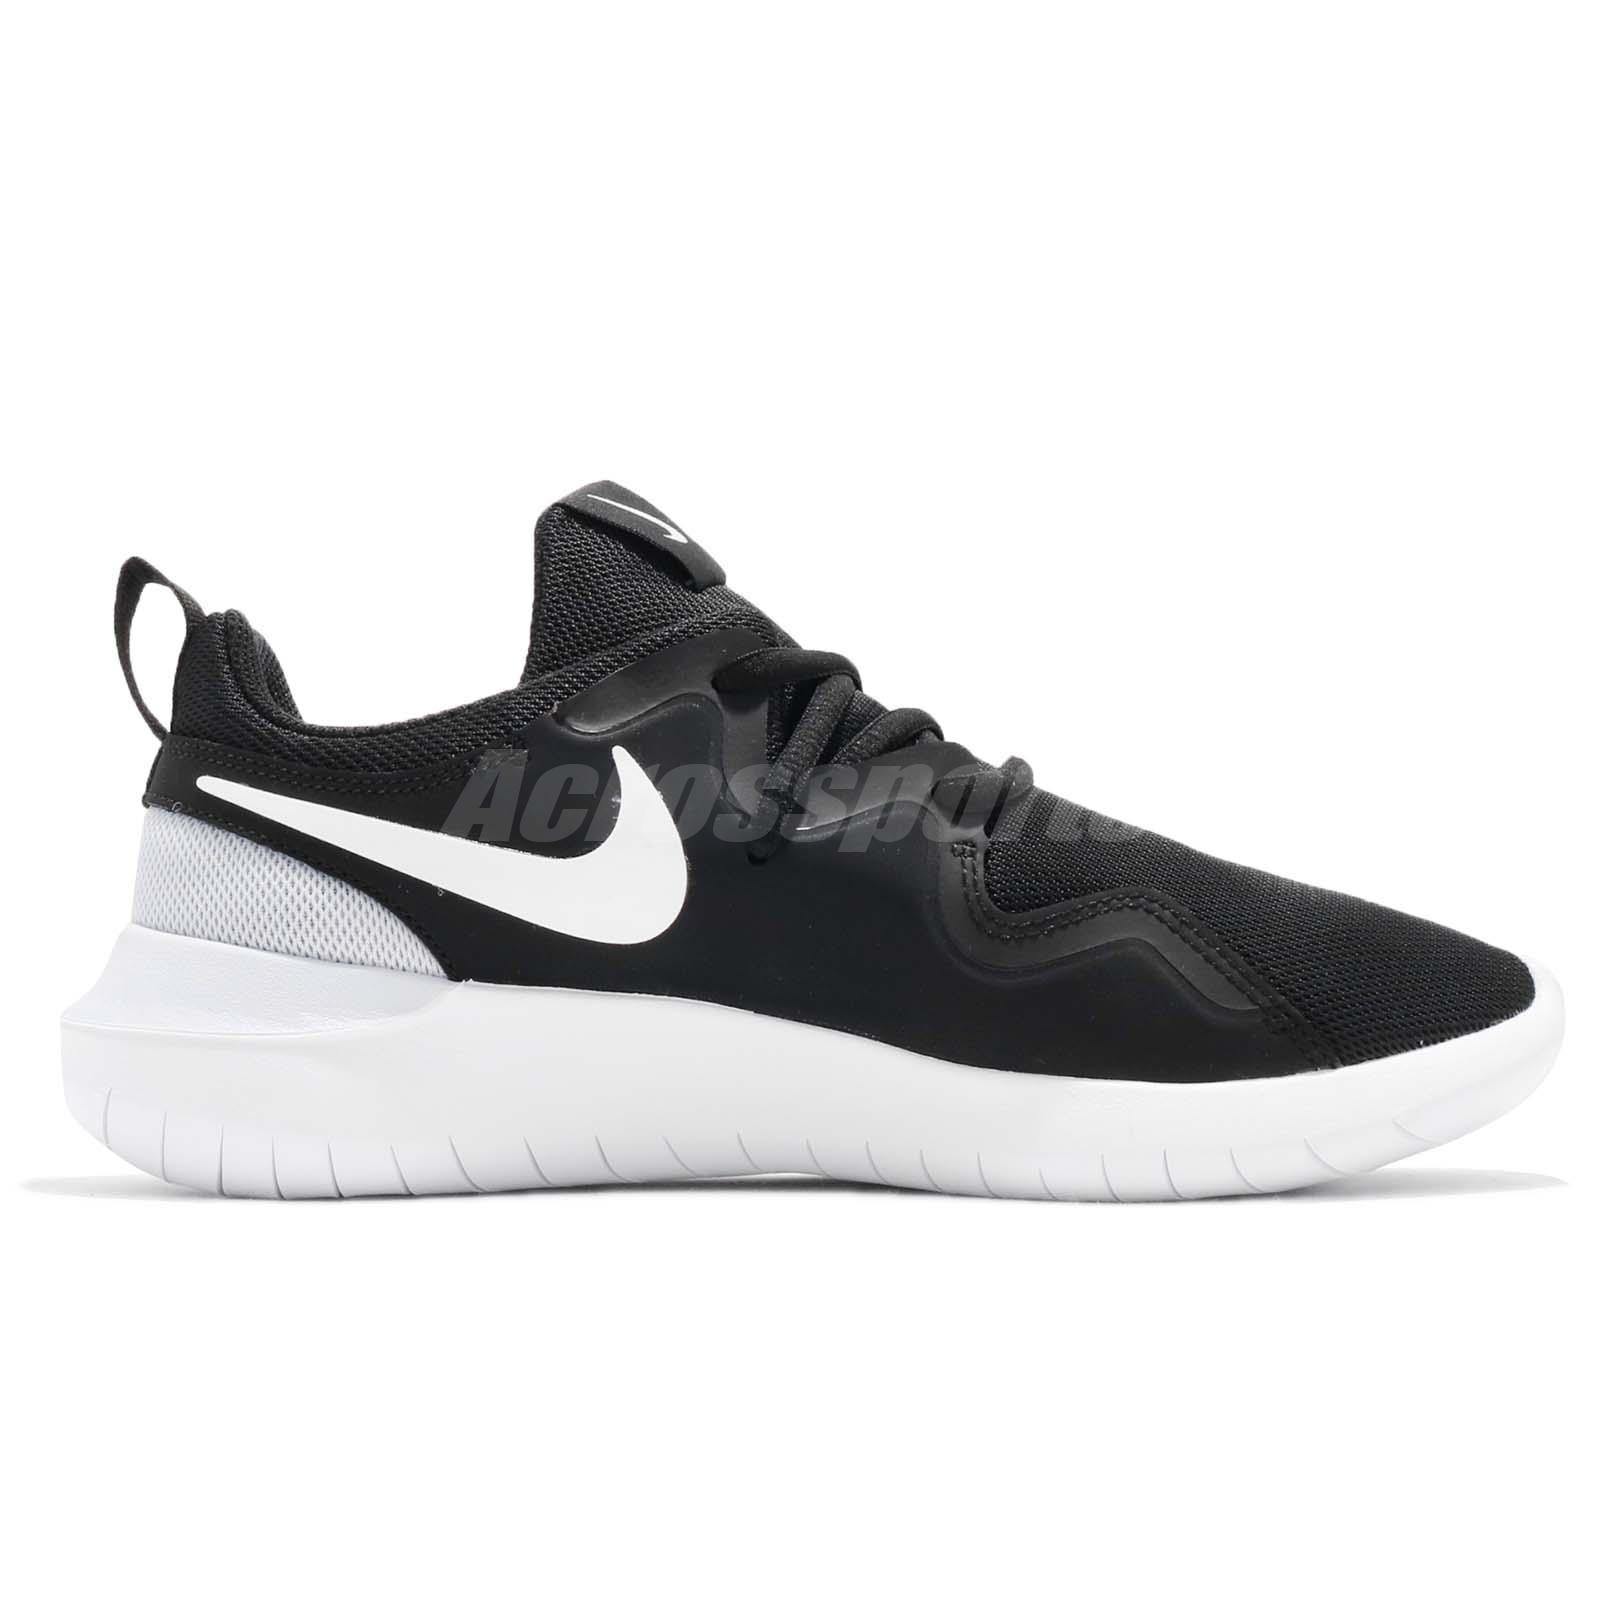 Wmns Nike Tessen Black White Pure Platinum Women Running Shoe ... 5b04955b1